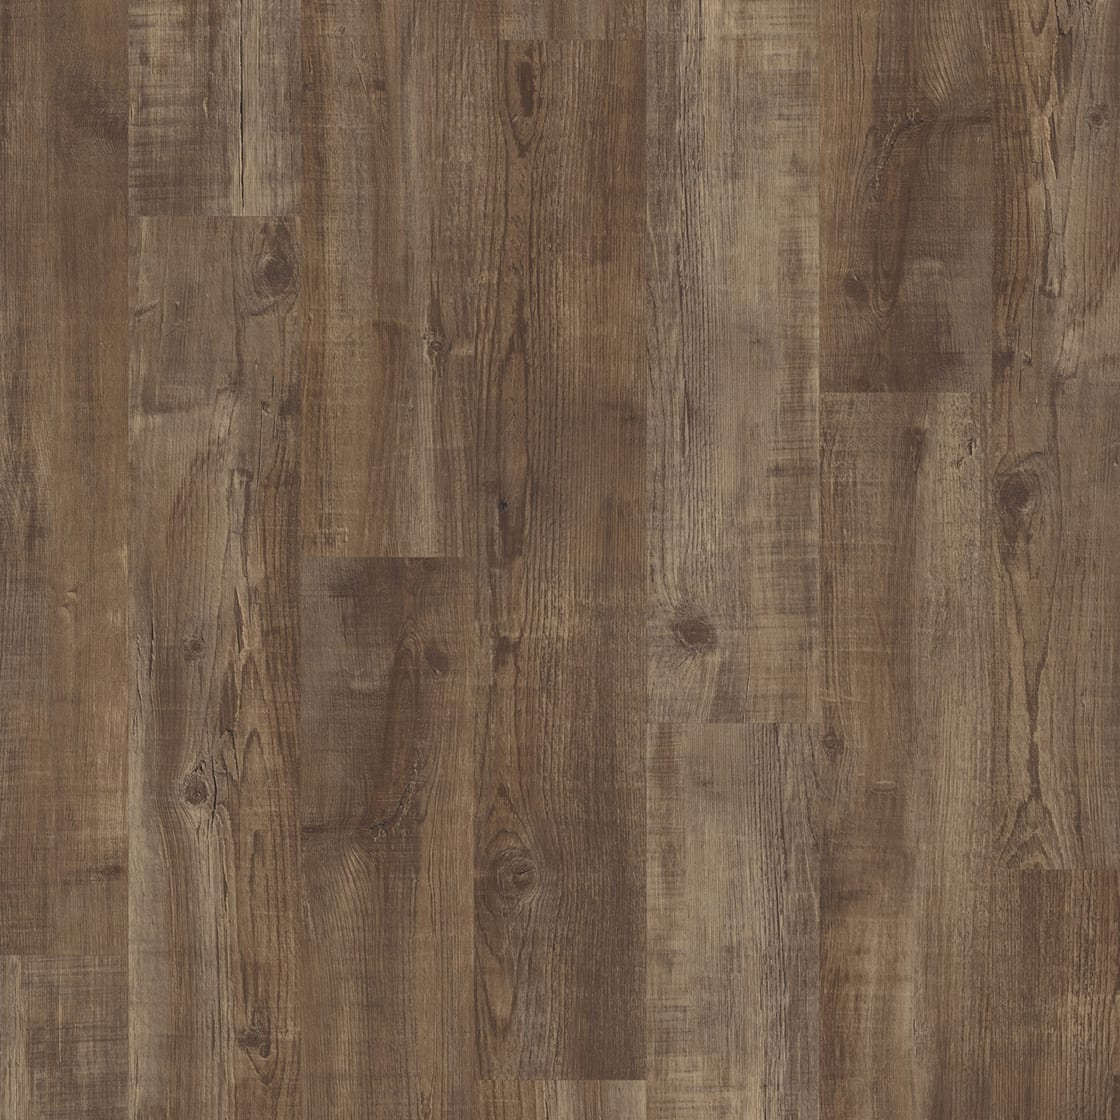 Karndean Knight Tile Wood Vinyl Plank Flooring Mckenzie